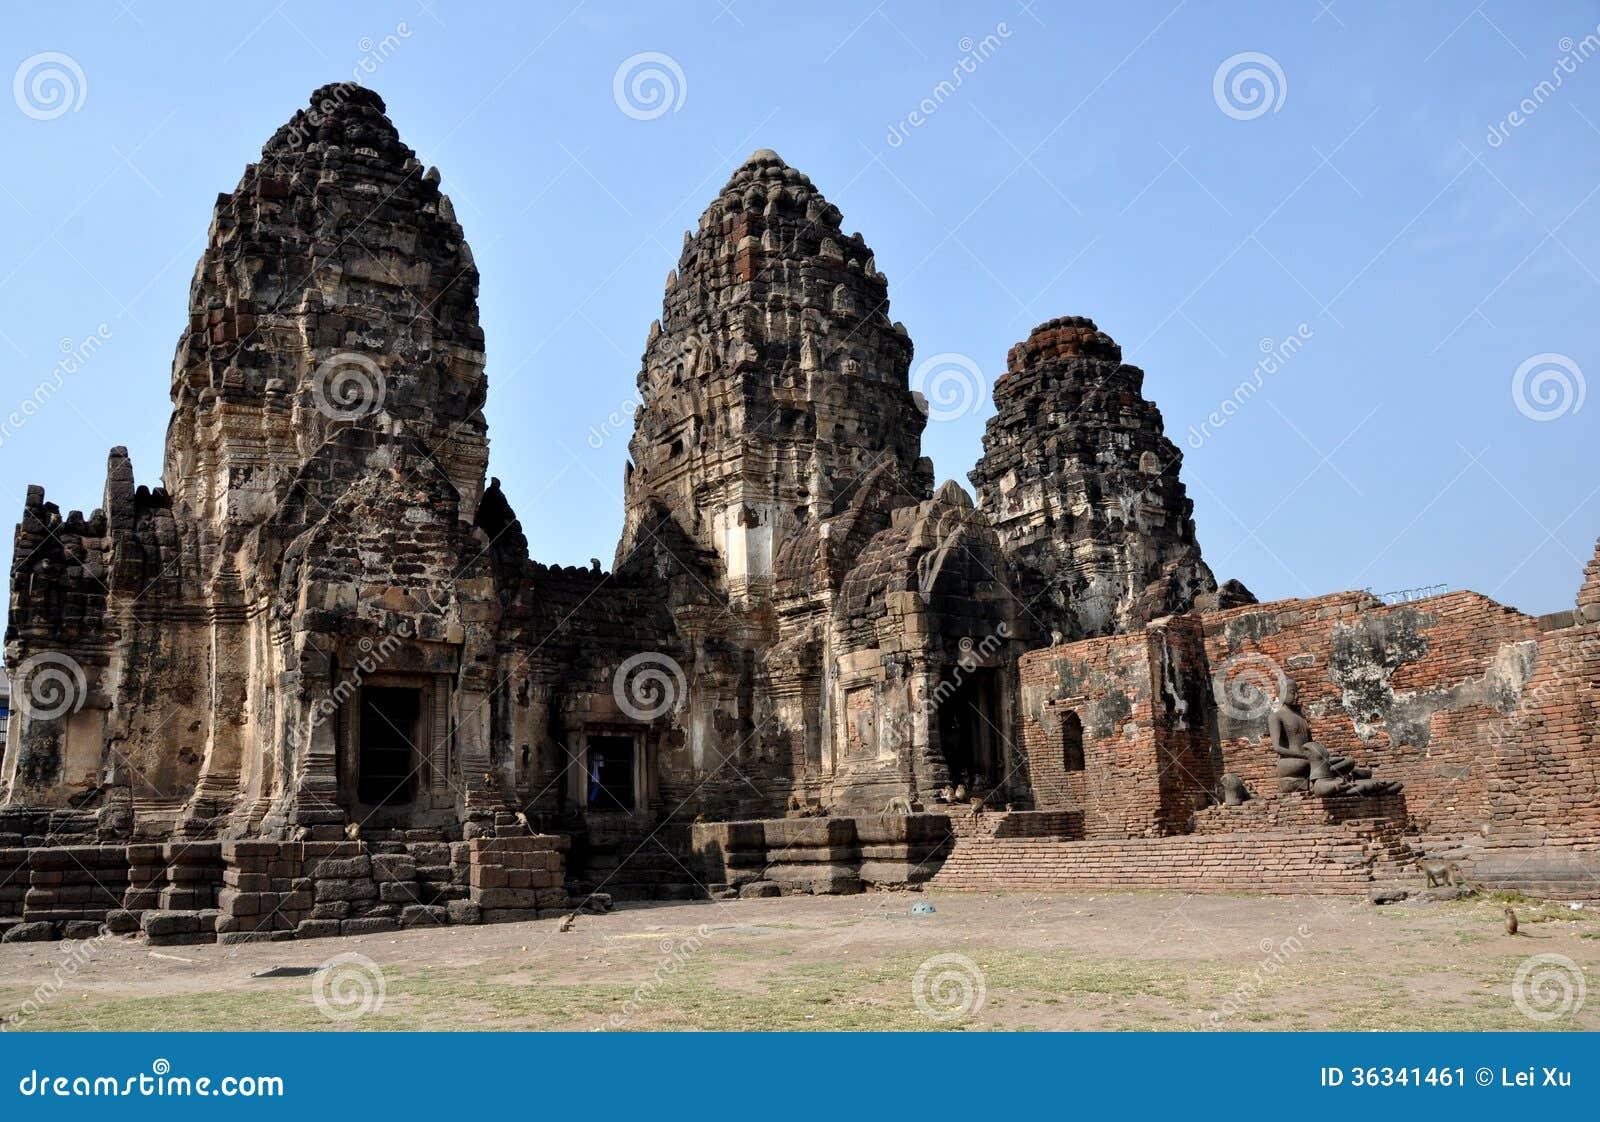 Lopburi Thailand  city photo : Lopburi, Thailand: Wat Phra Phang San Yot Stock Image Image ...